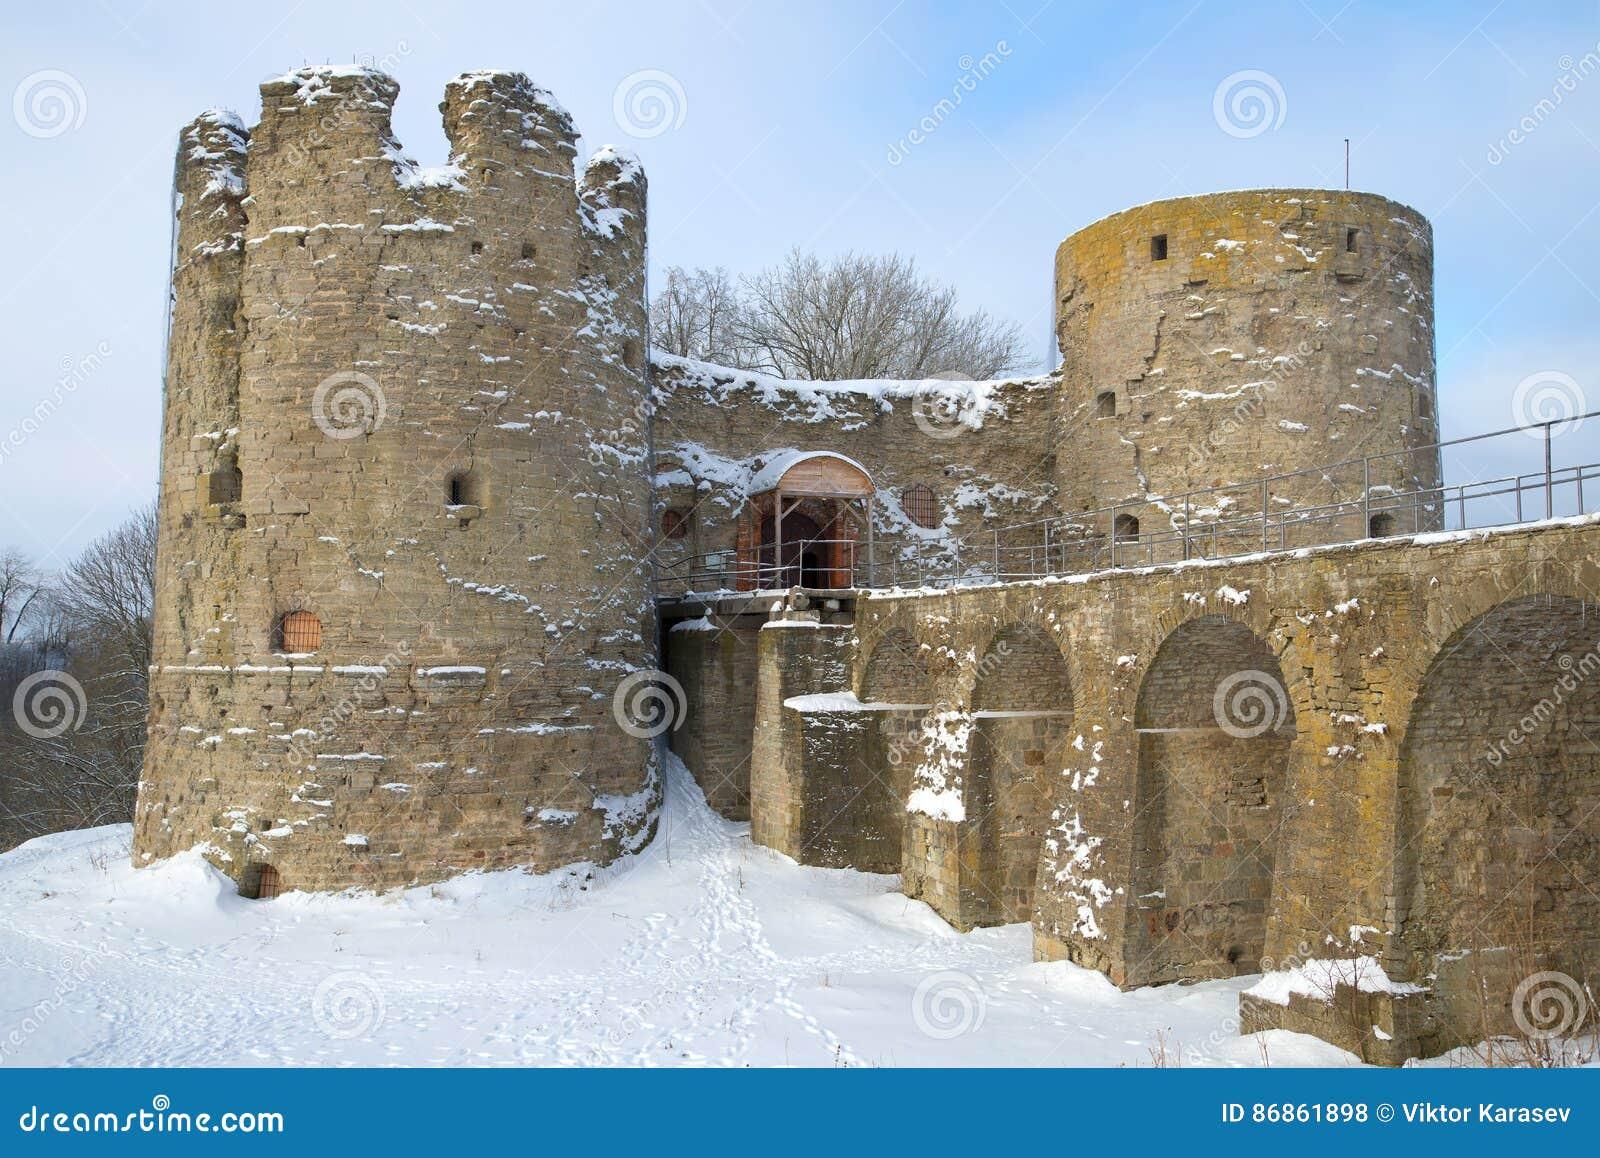 Medieval fortress Koporye closeup, cloudy February day. Leningrad region, Russia